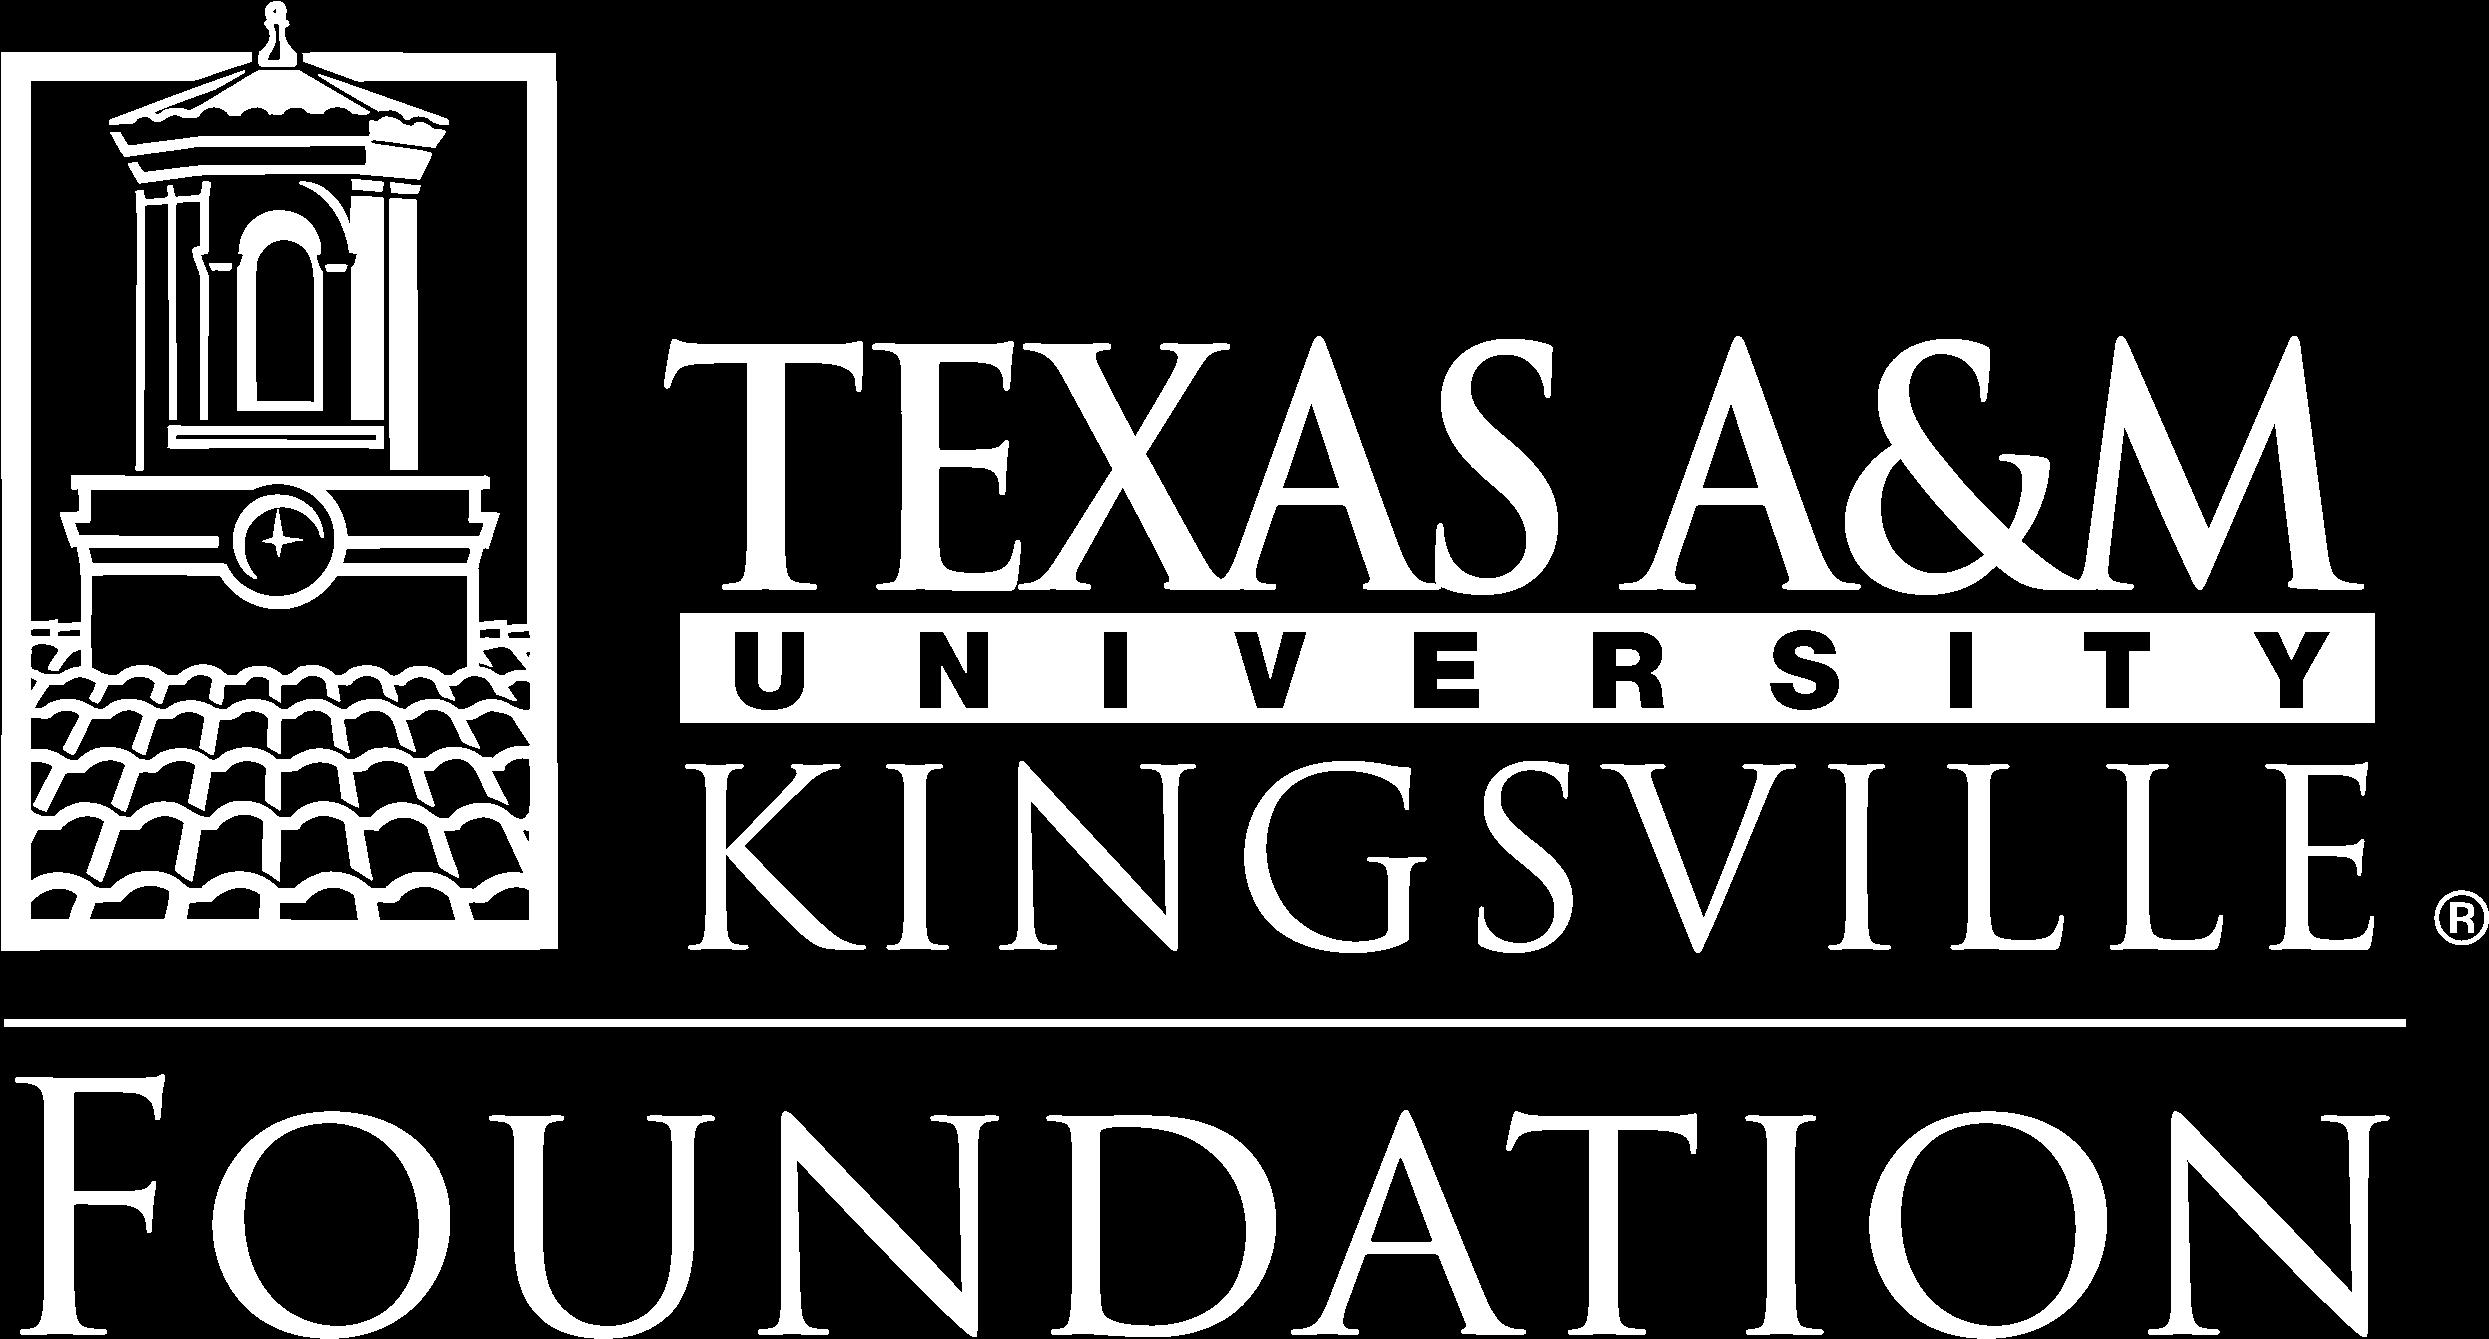 Transparent texas a&m clipart - Texas A&m University-kingsville Foundation - Texas A&m University–kingsville